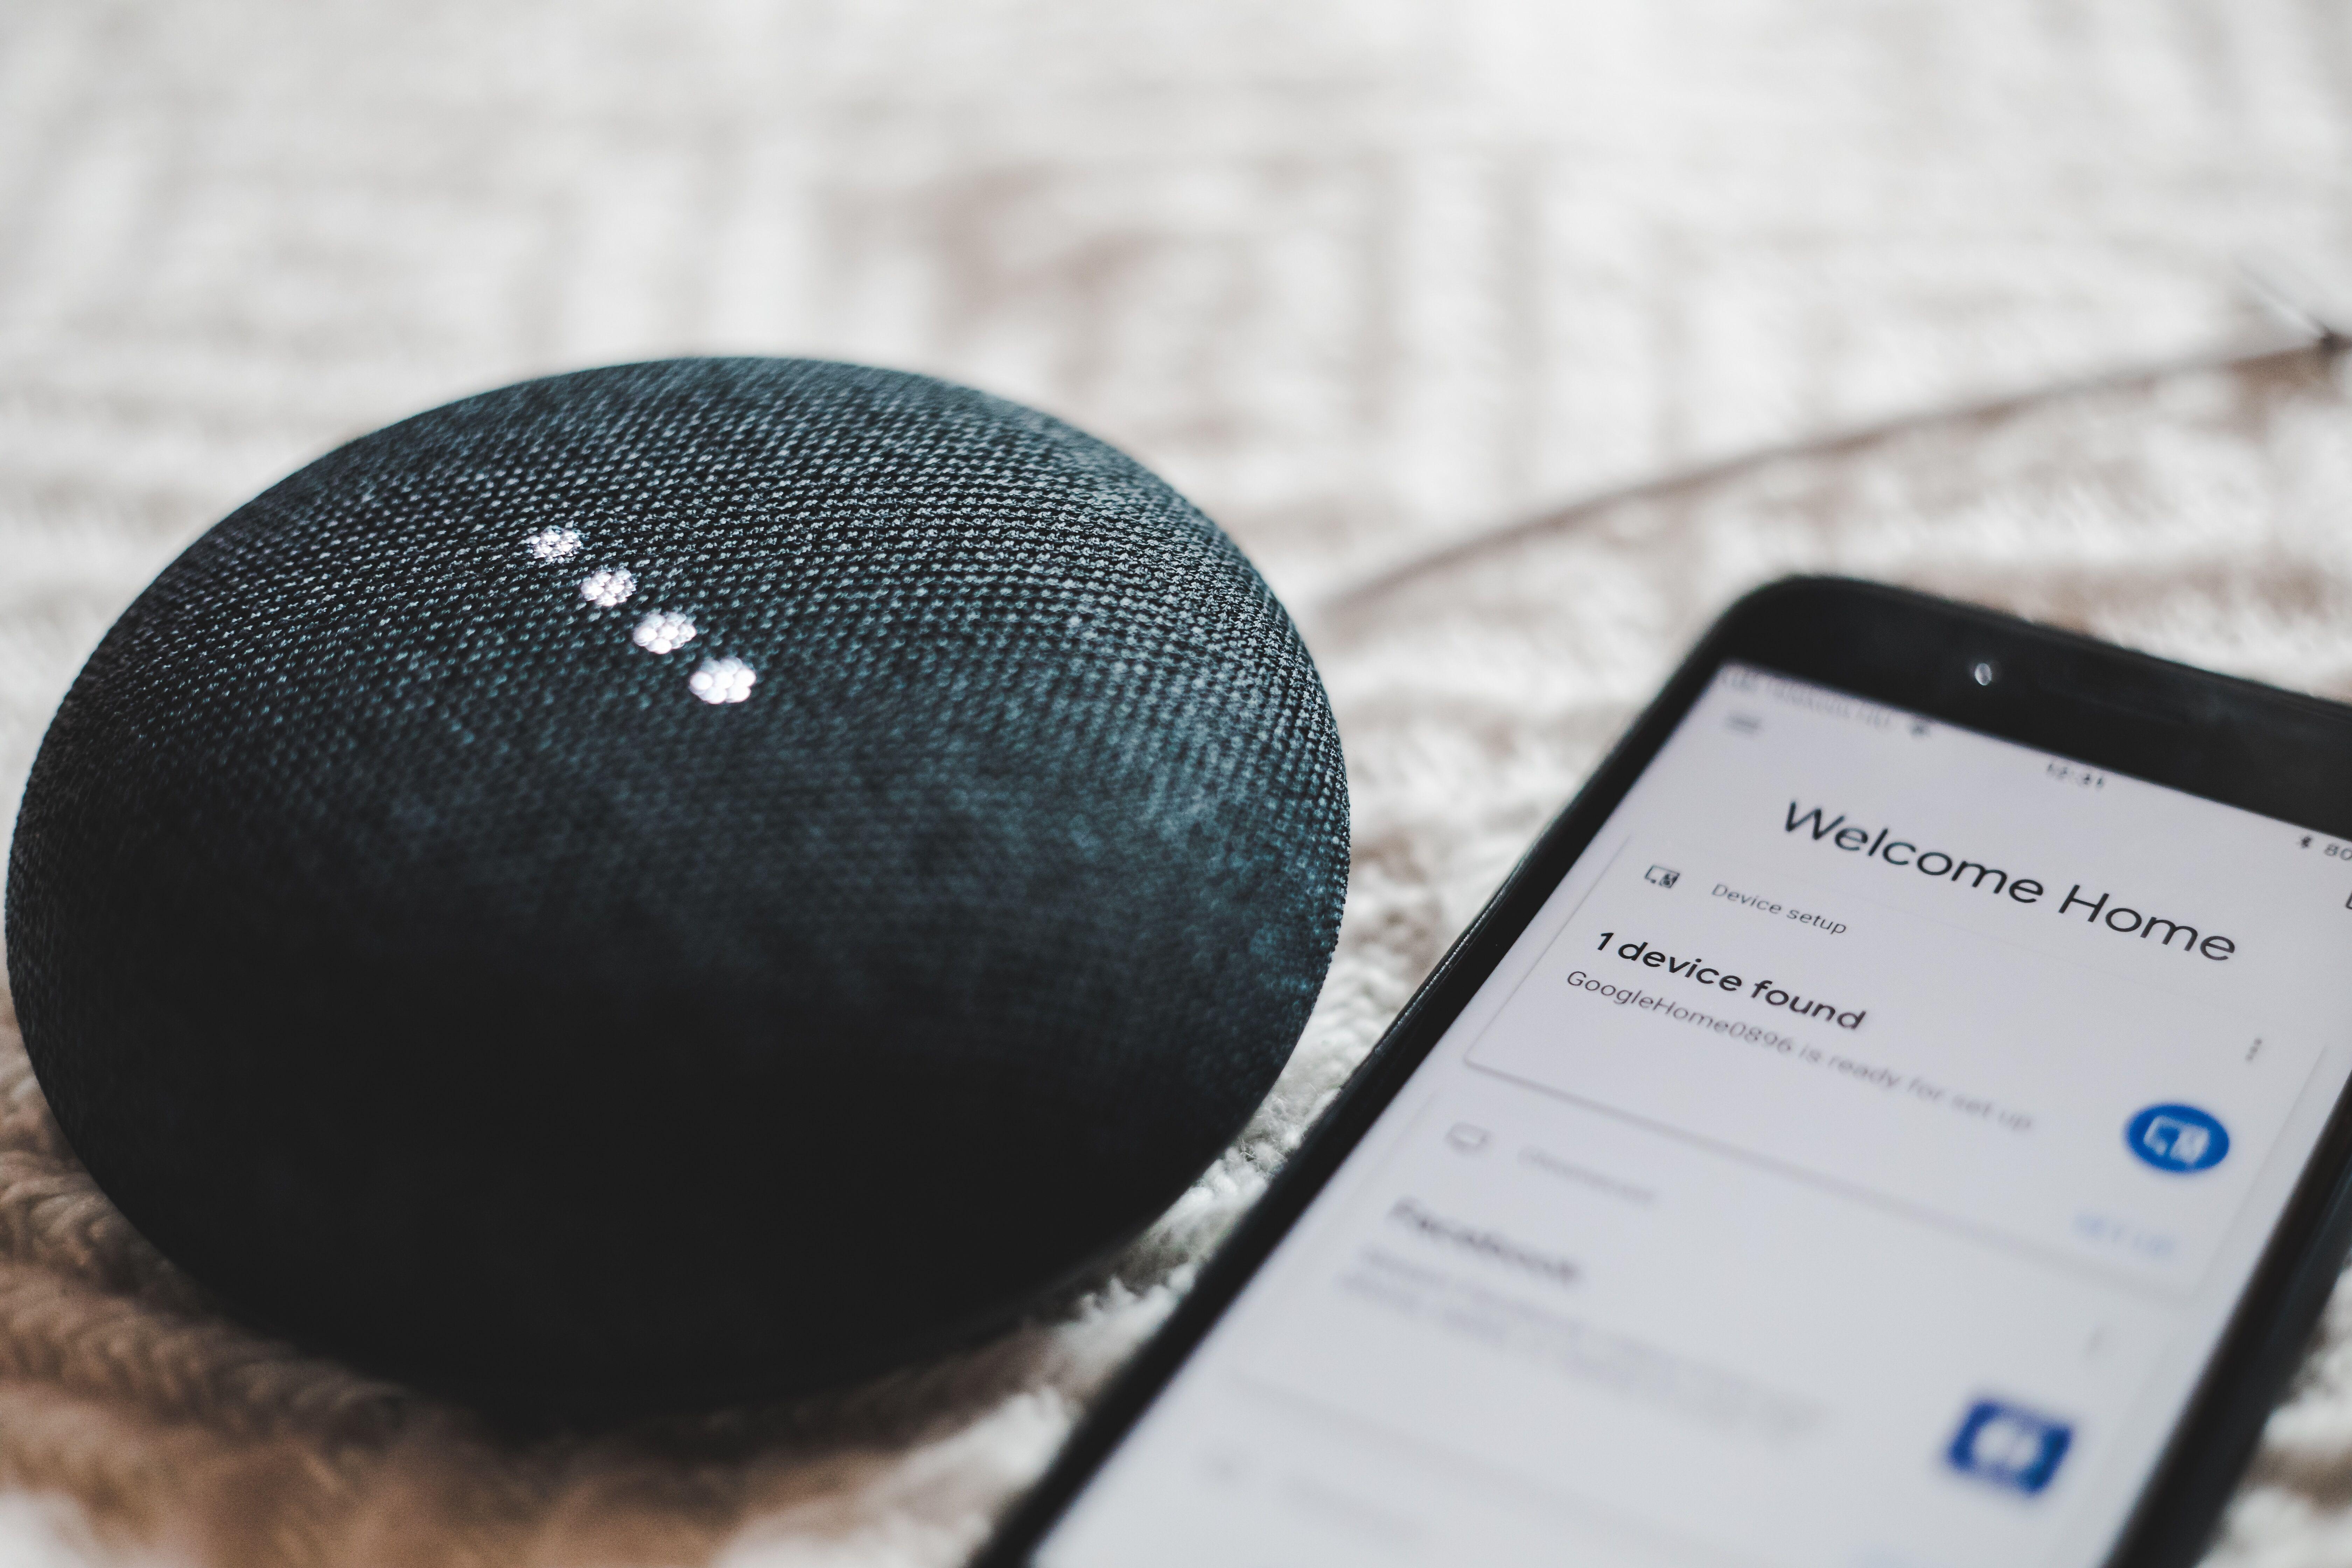 Alexa features